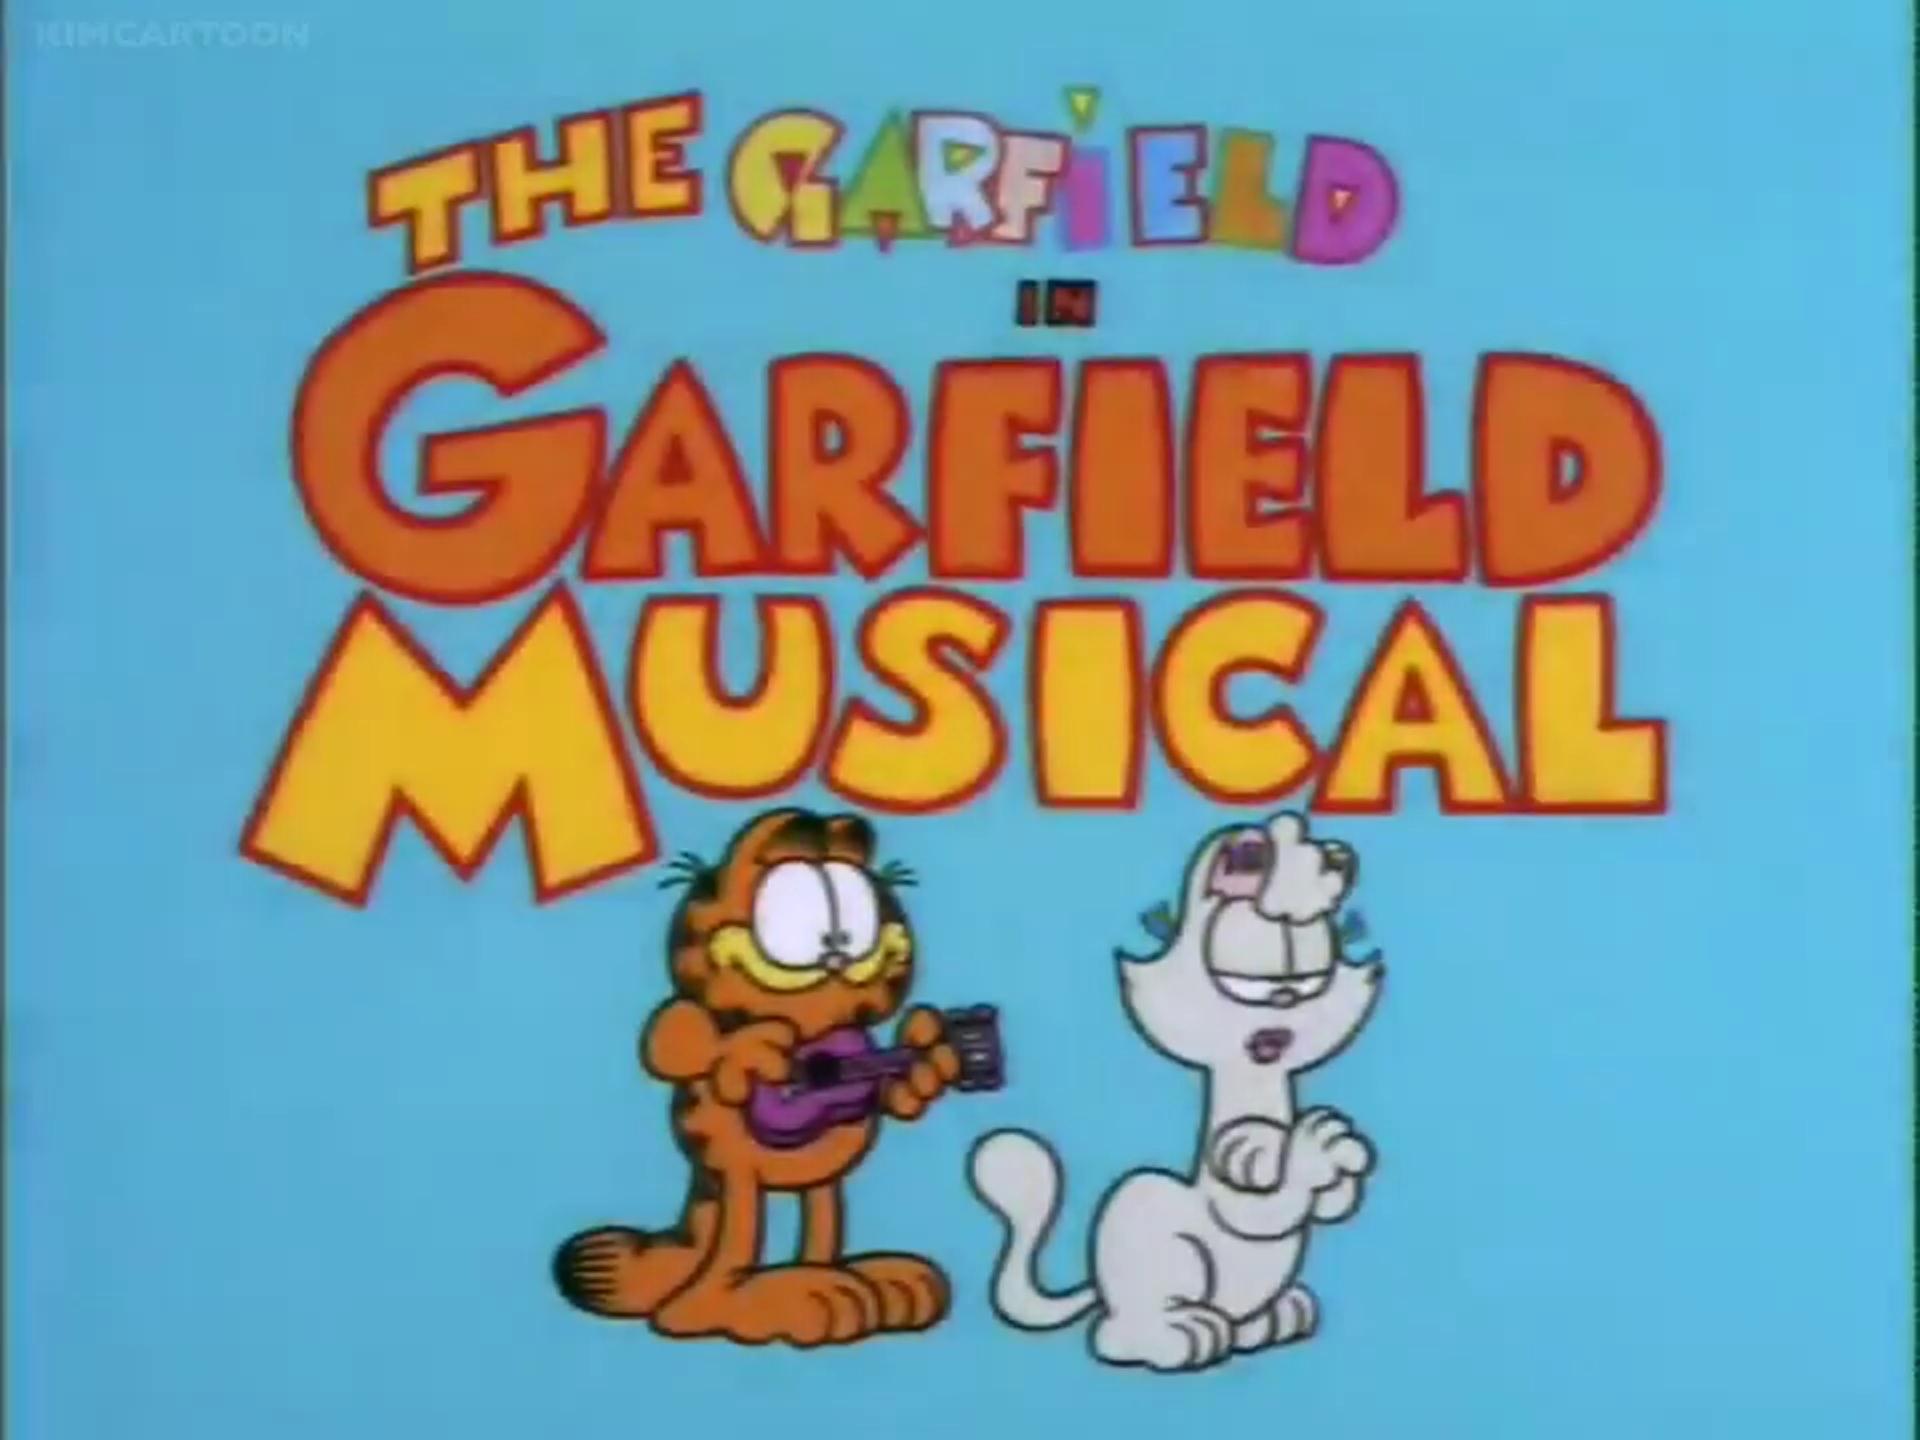 The Garfield Musical